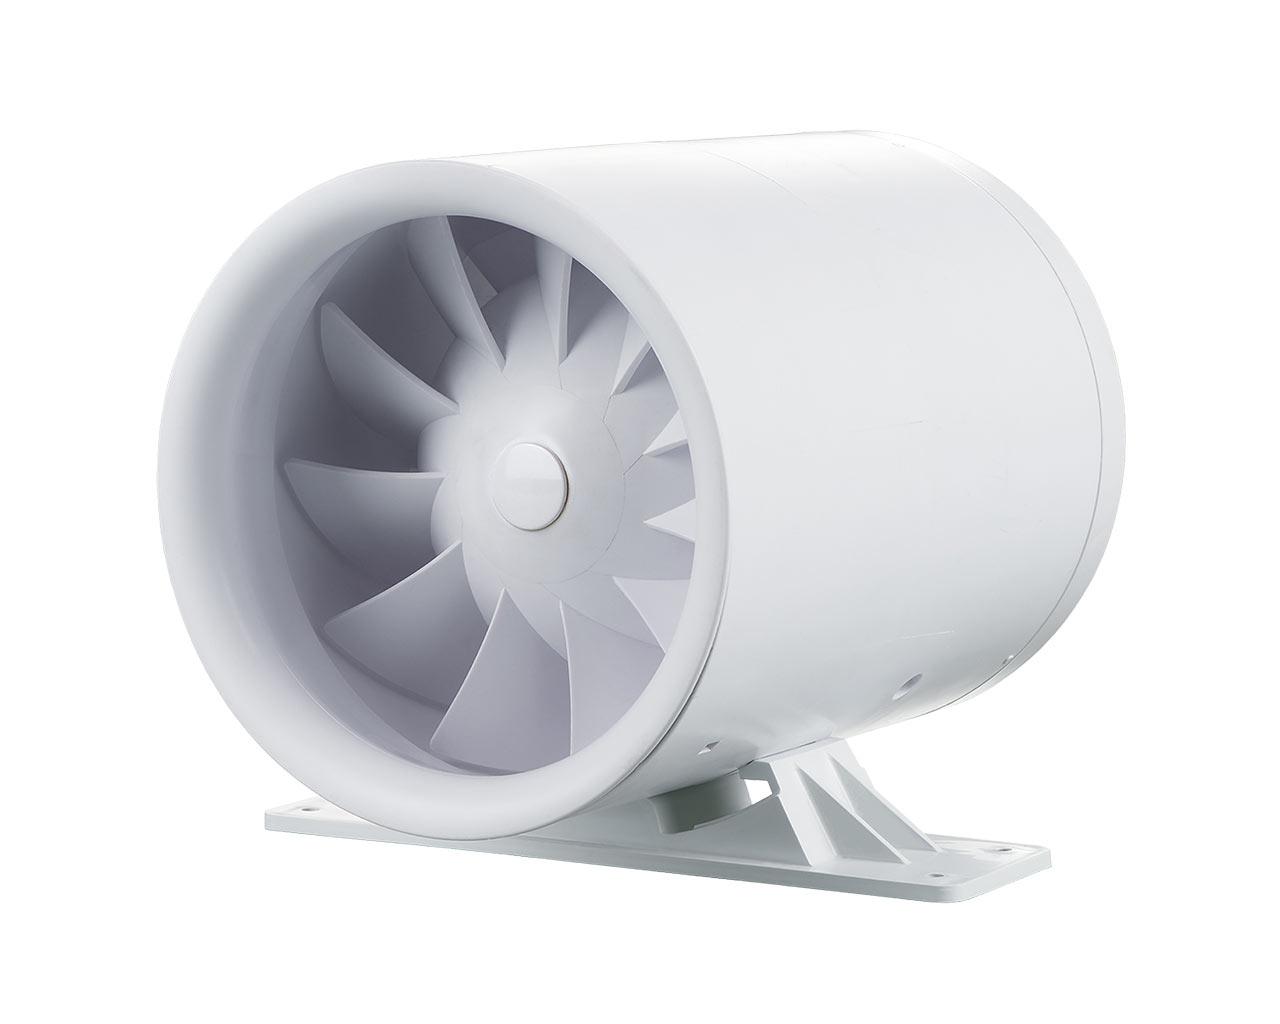 SIKU 100 Turbine-k Duo